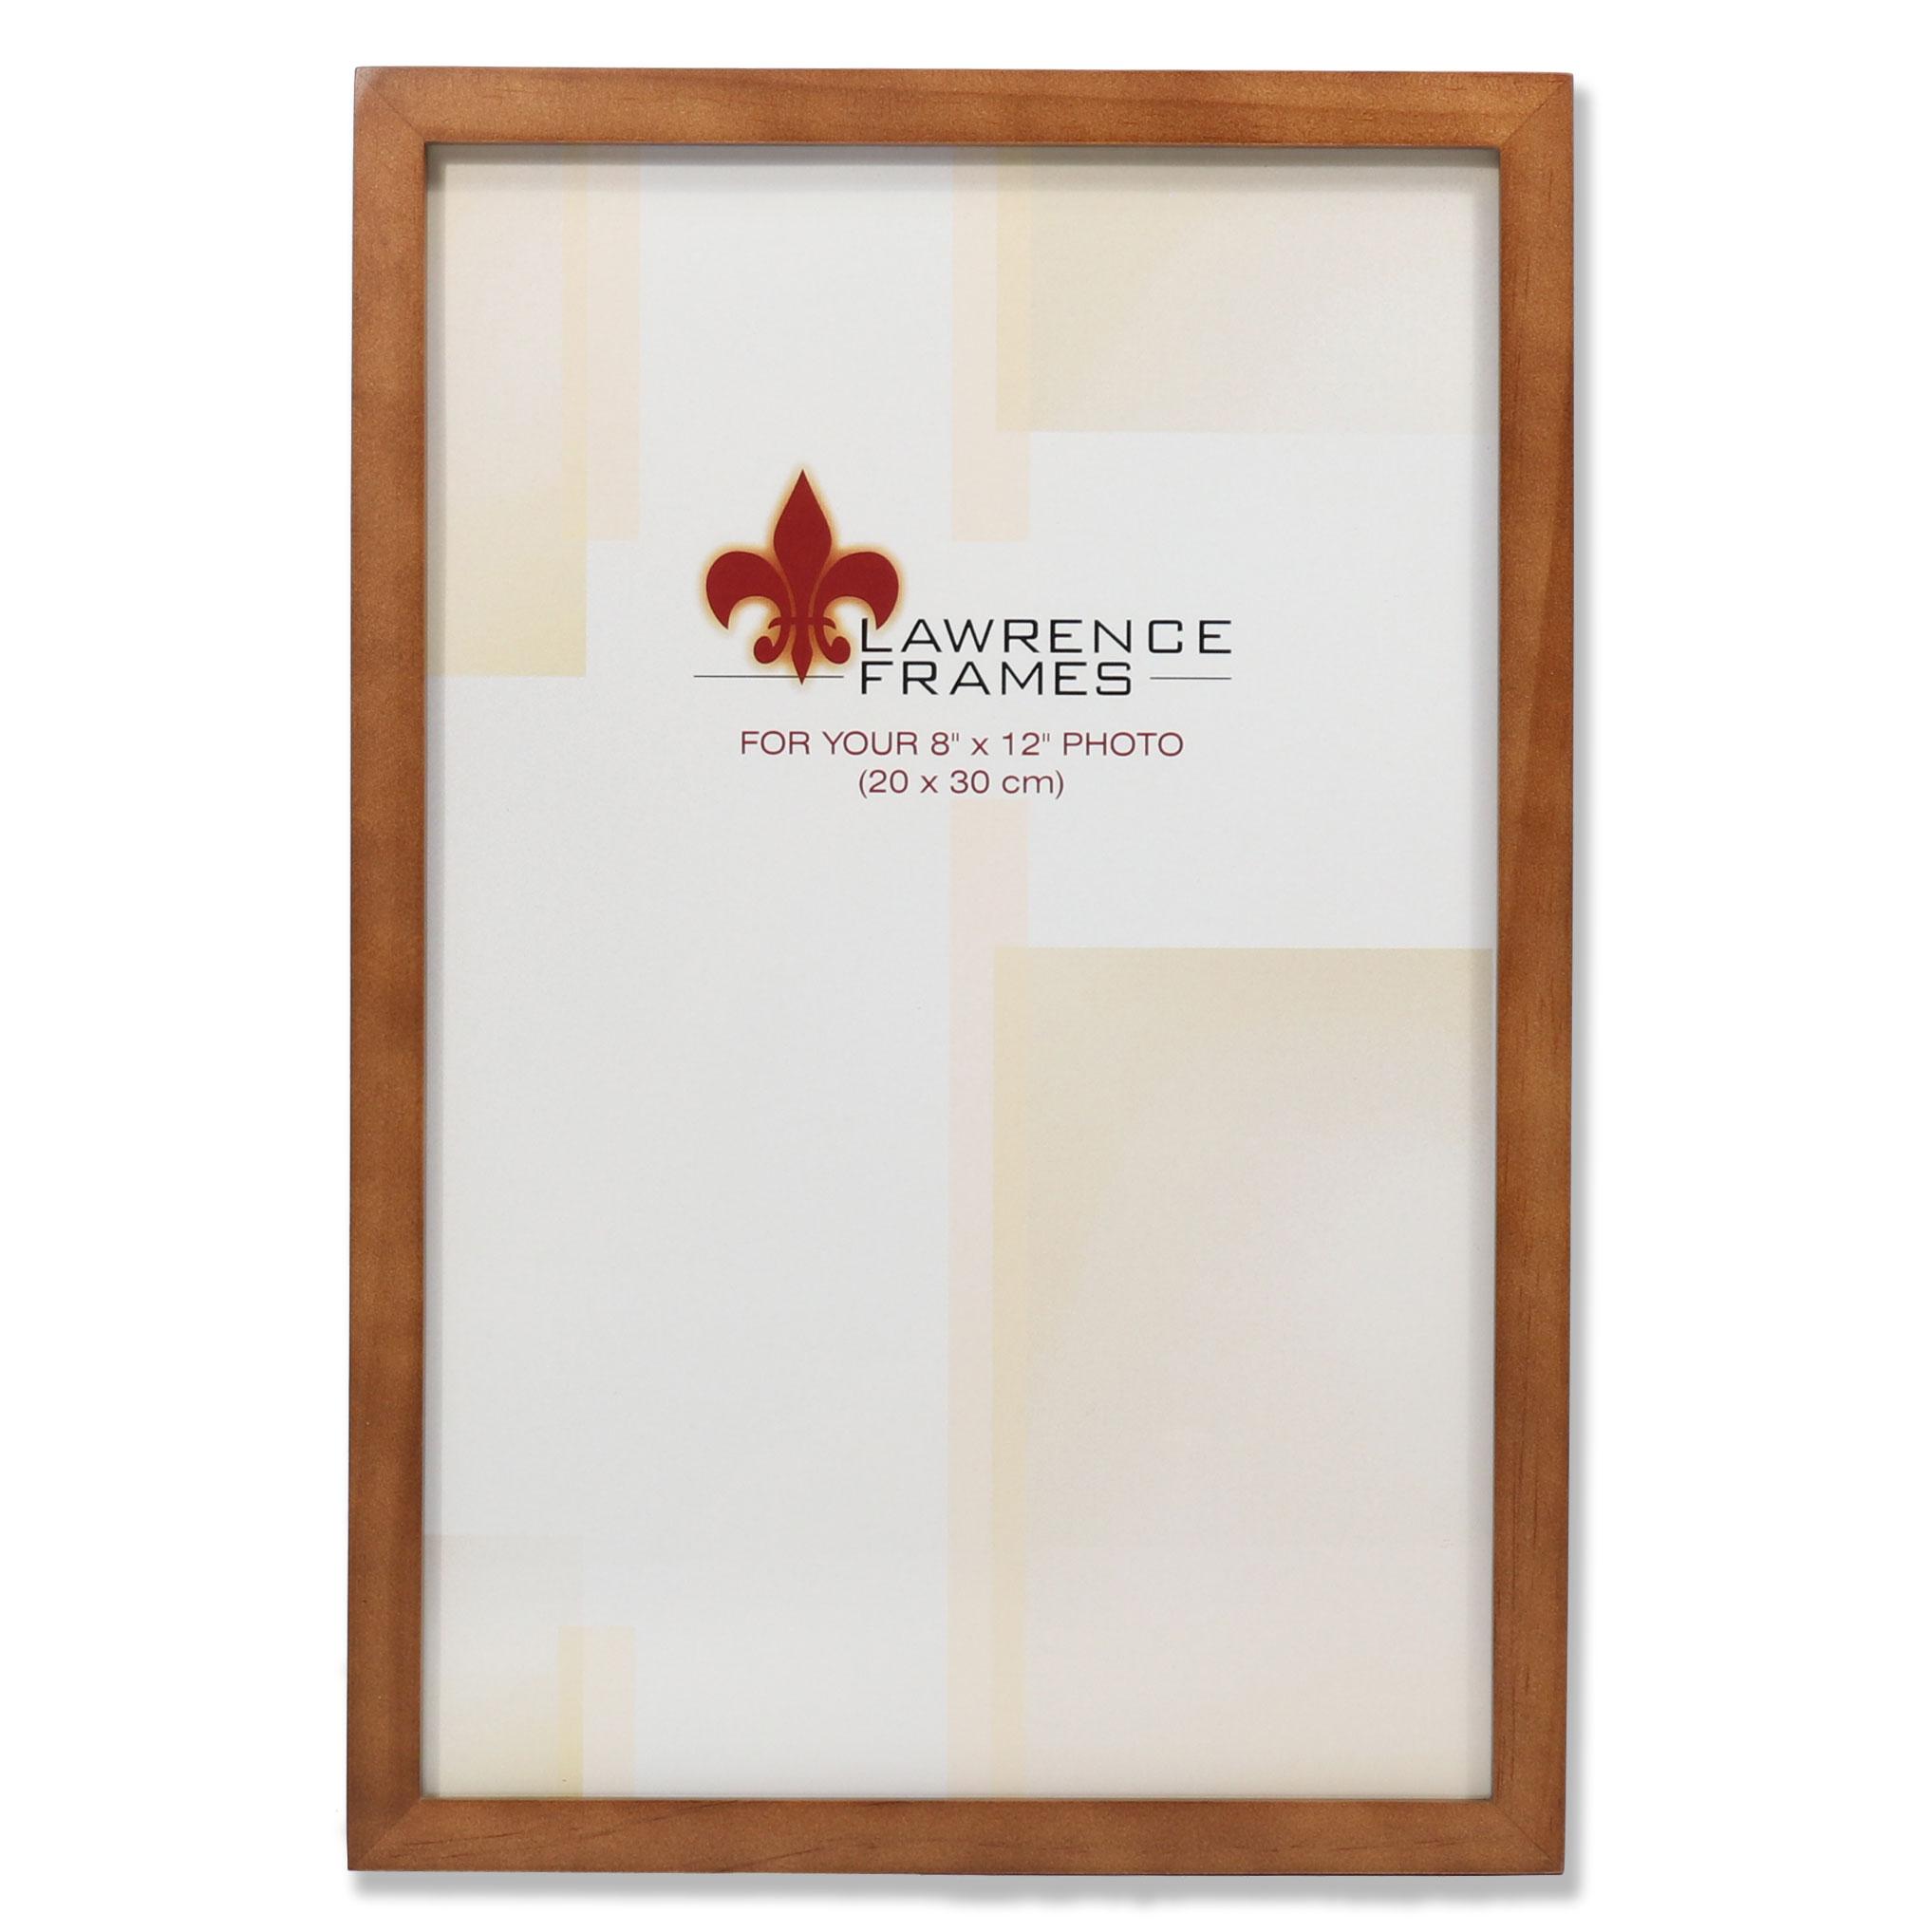 766082 Nutmeg Wood 8x12 Picture Frame Photoframes Net